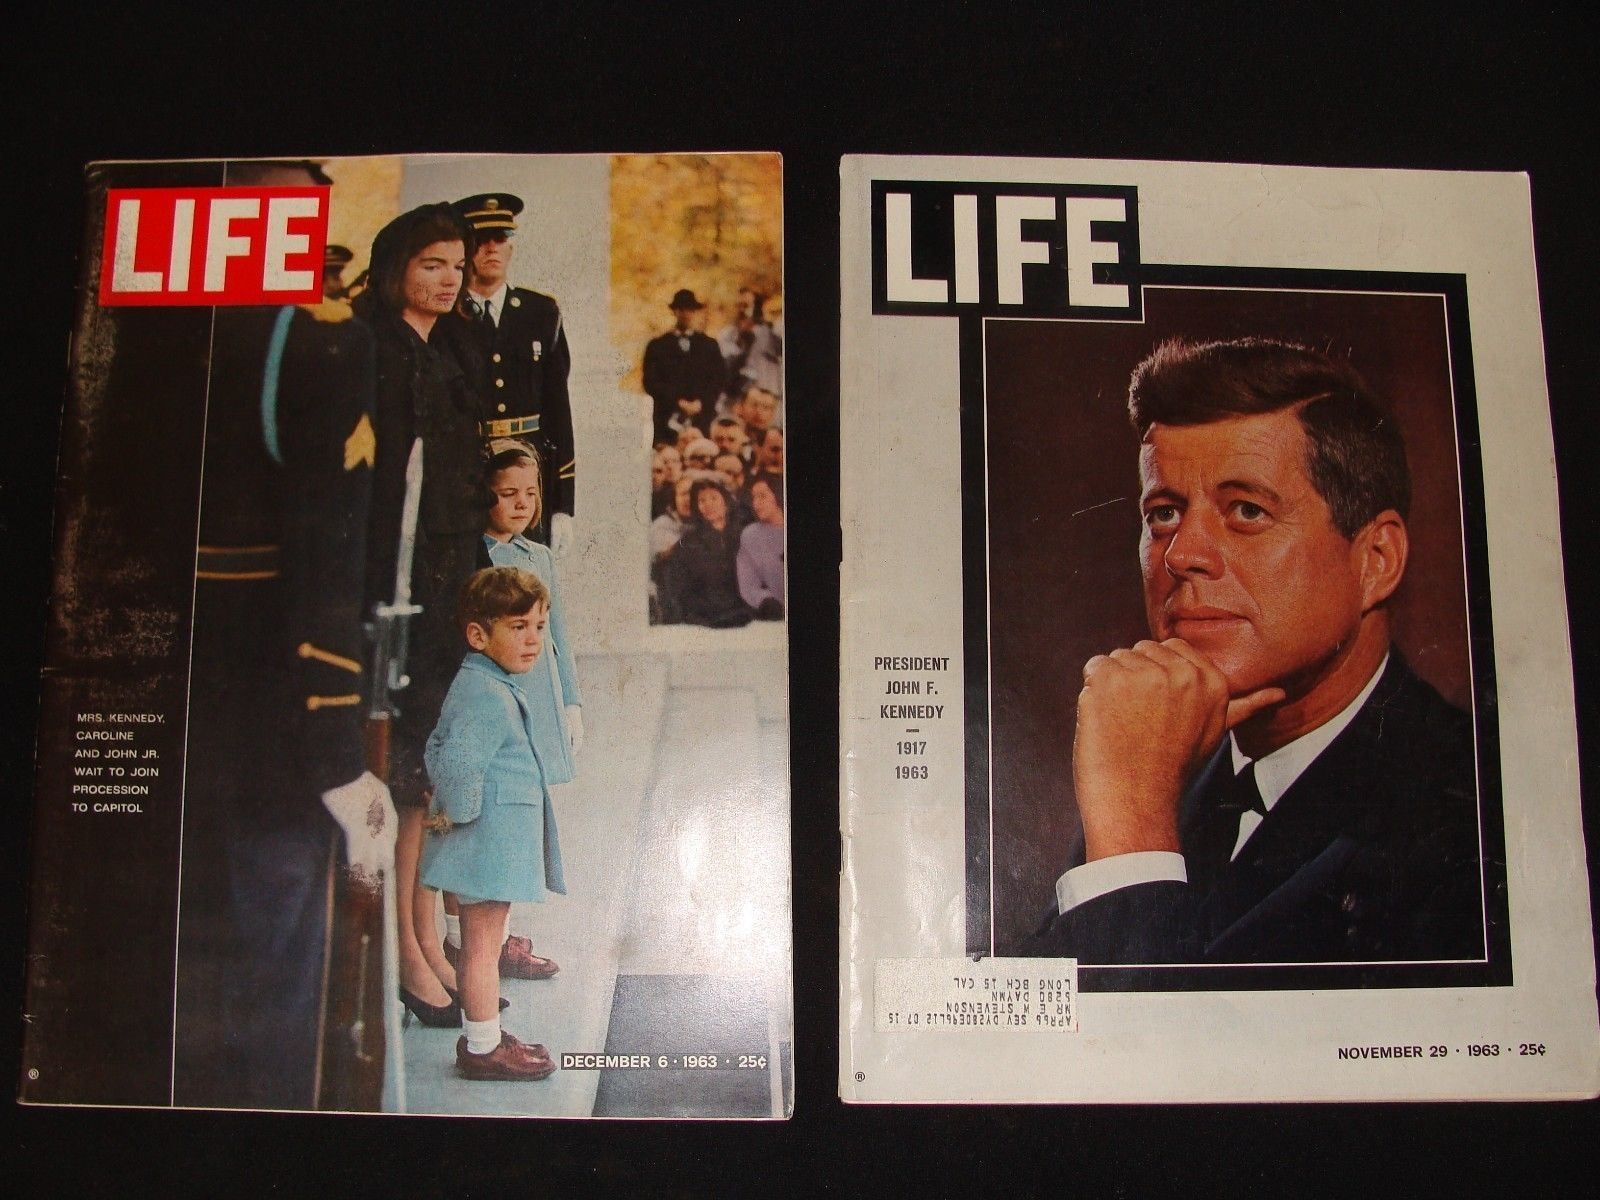 LIFE MAGAZINE NOVEMBER 29 TH 1963 JOHN KENNEDY